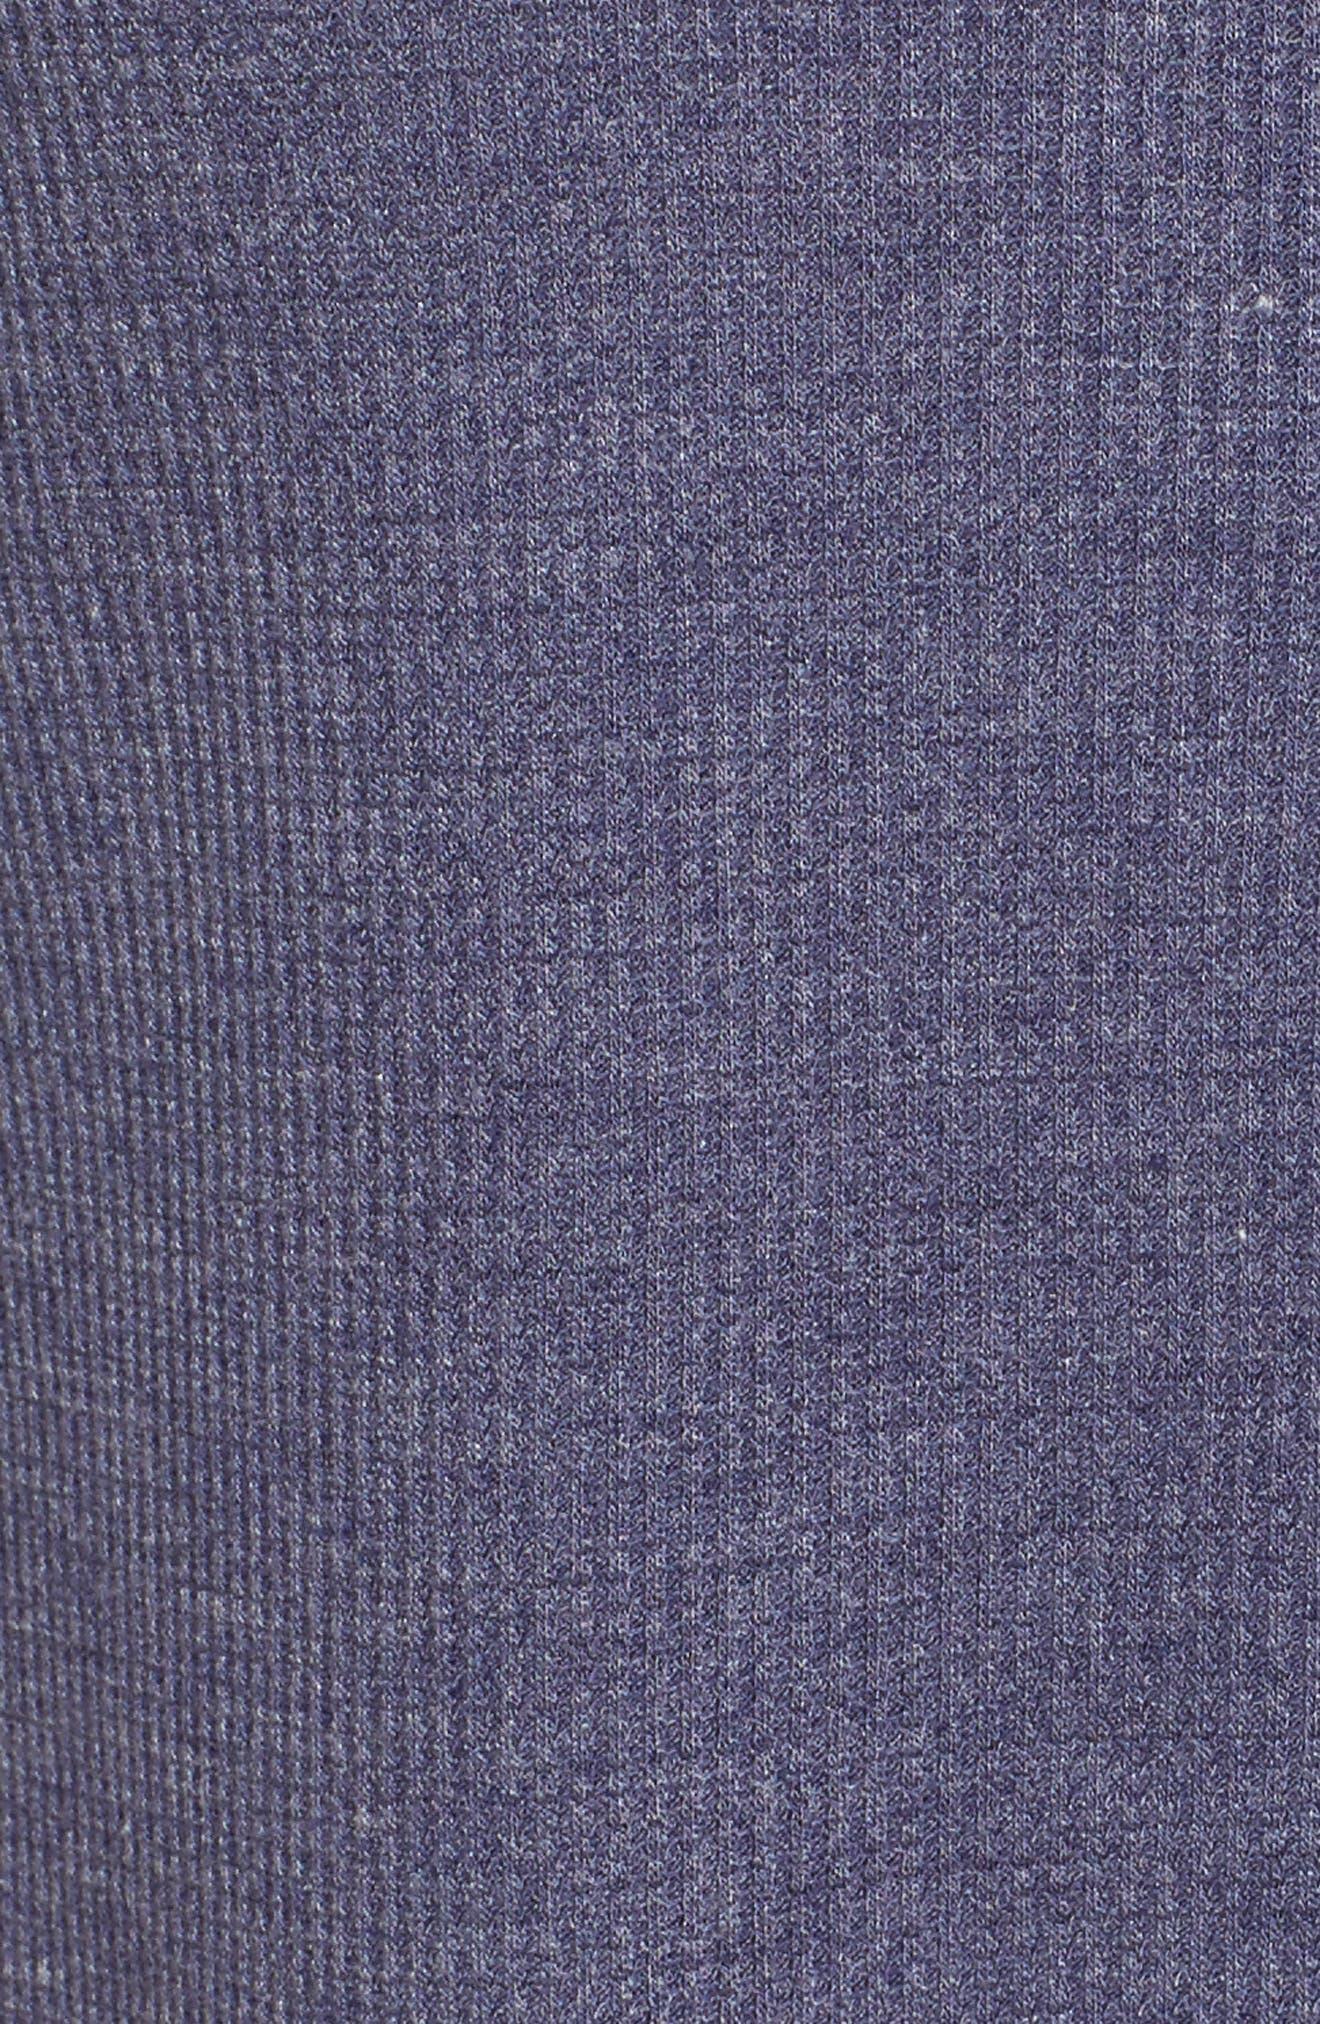 Sleep Shirt,                             Alternate thumbnail 5, color,                             425